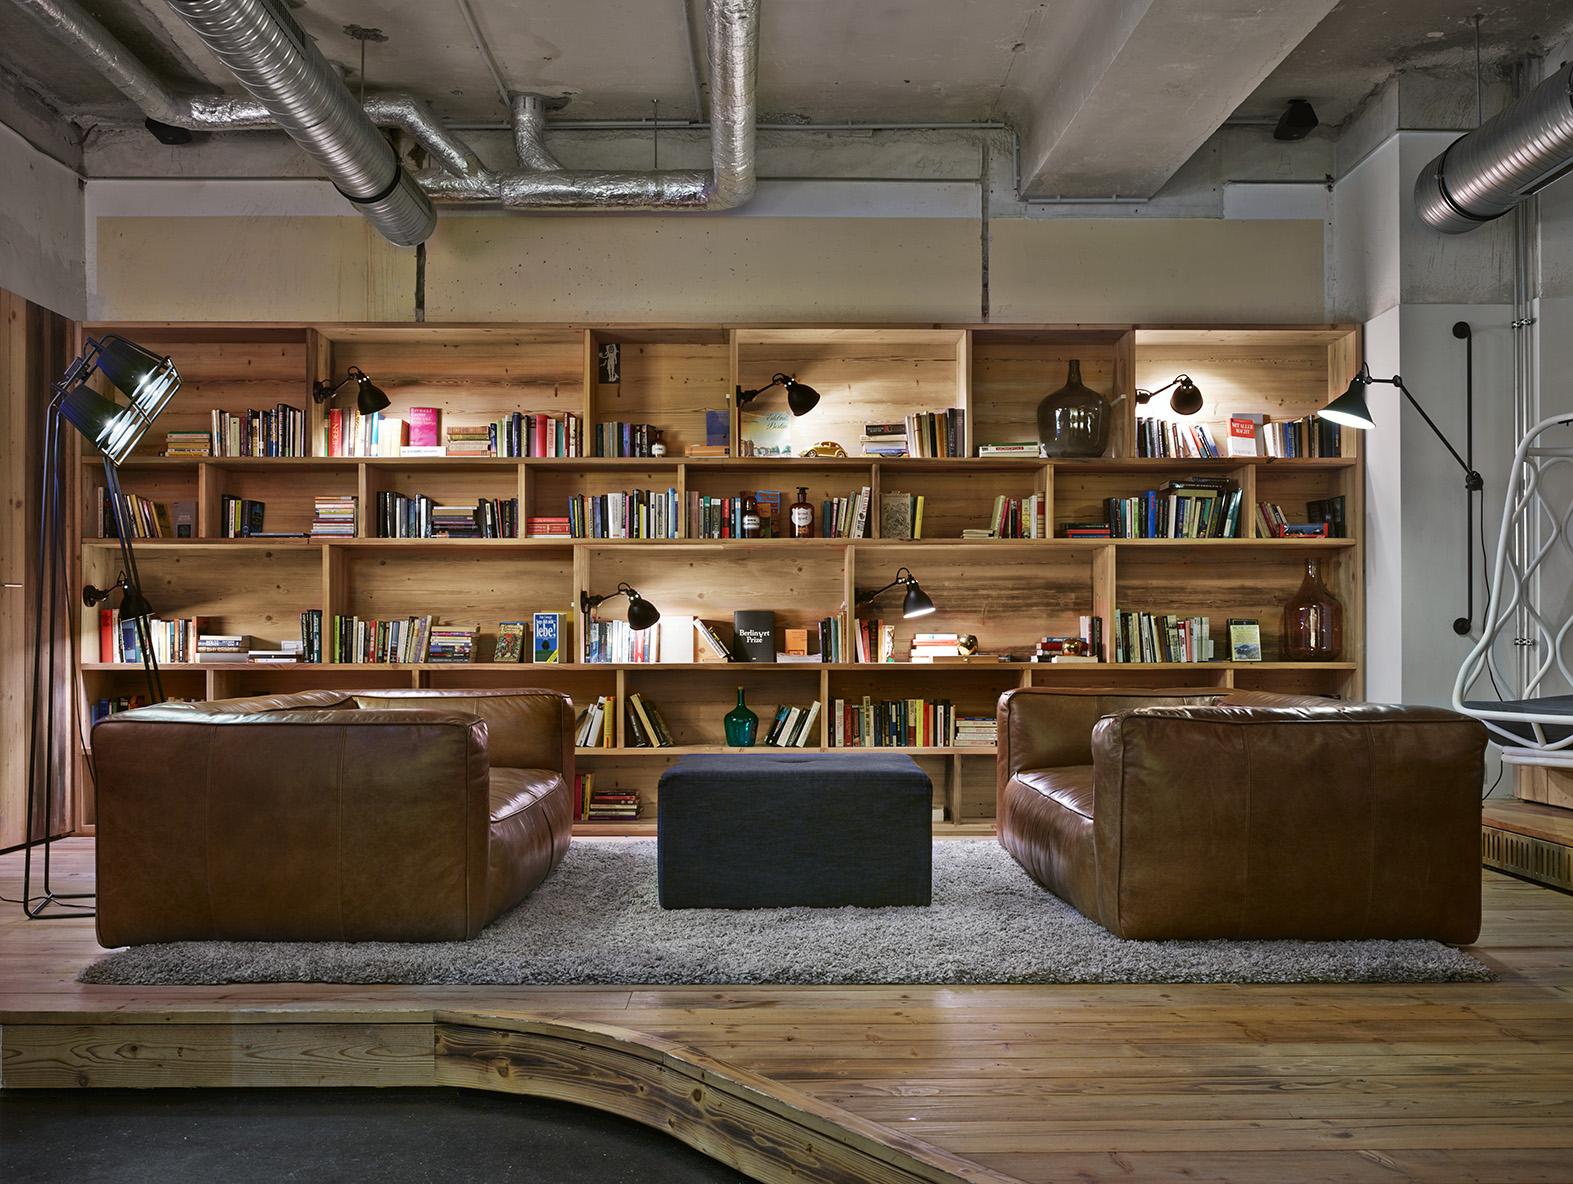 generator berlin mitte designagency waf architekten ester bruzkus architects archello. Black Bedroom Furniture Sets. Home Design Ideas